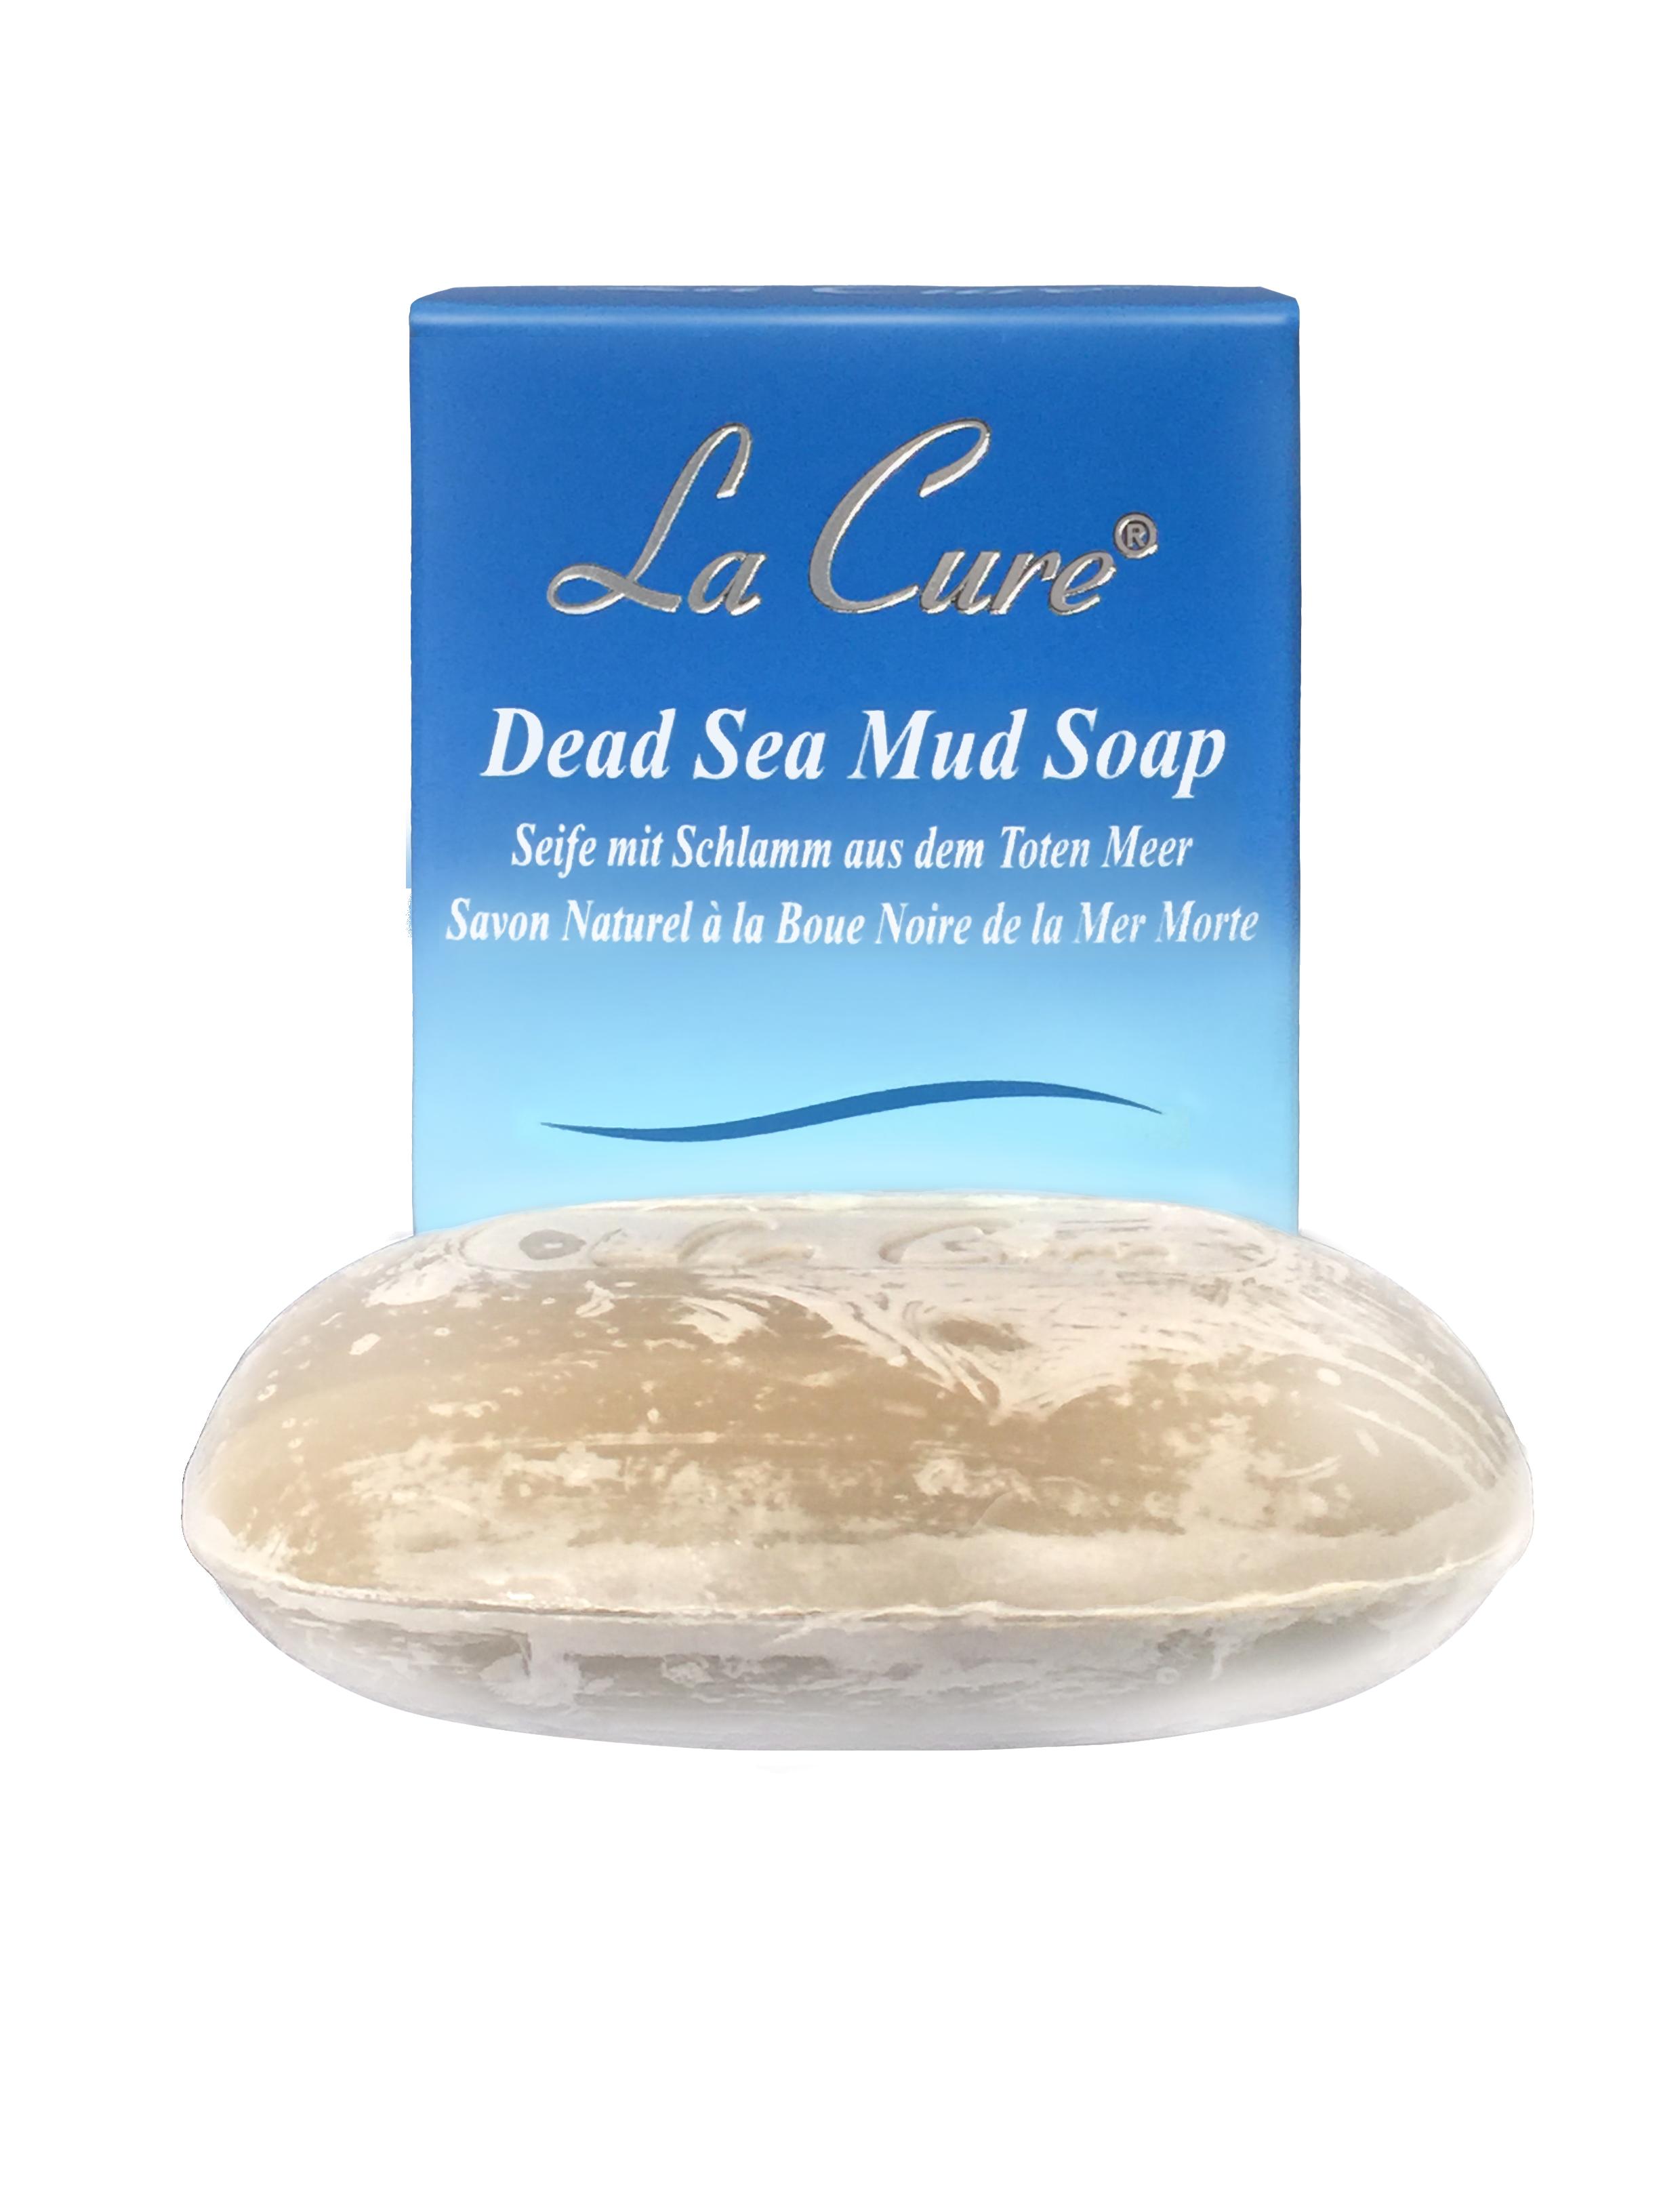 Dead-Sea-Mud-Soap